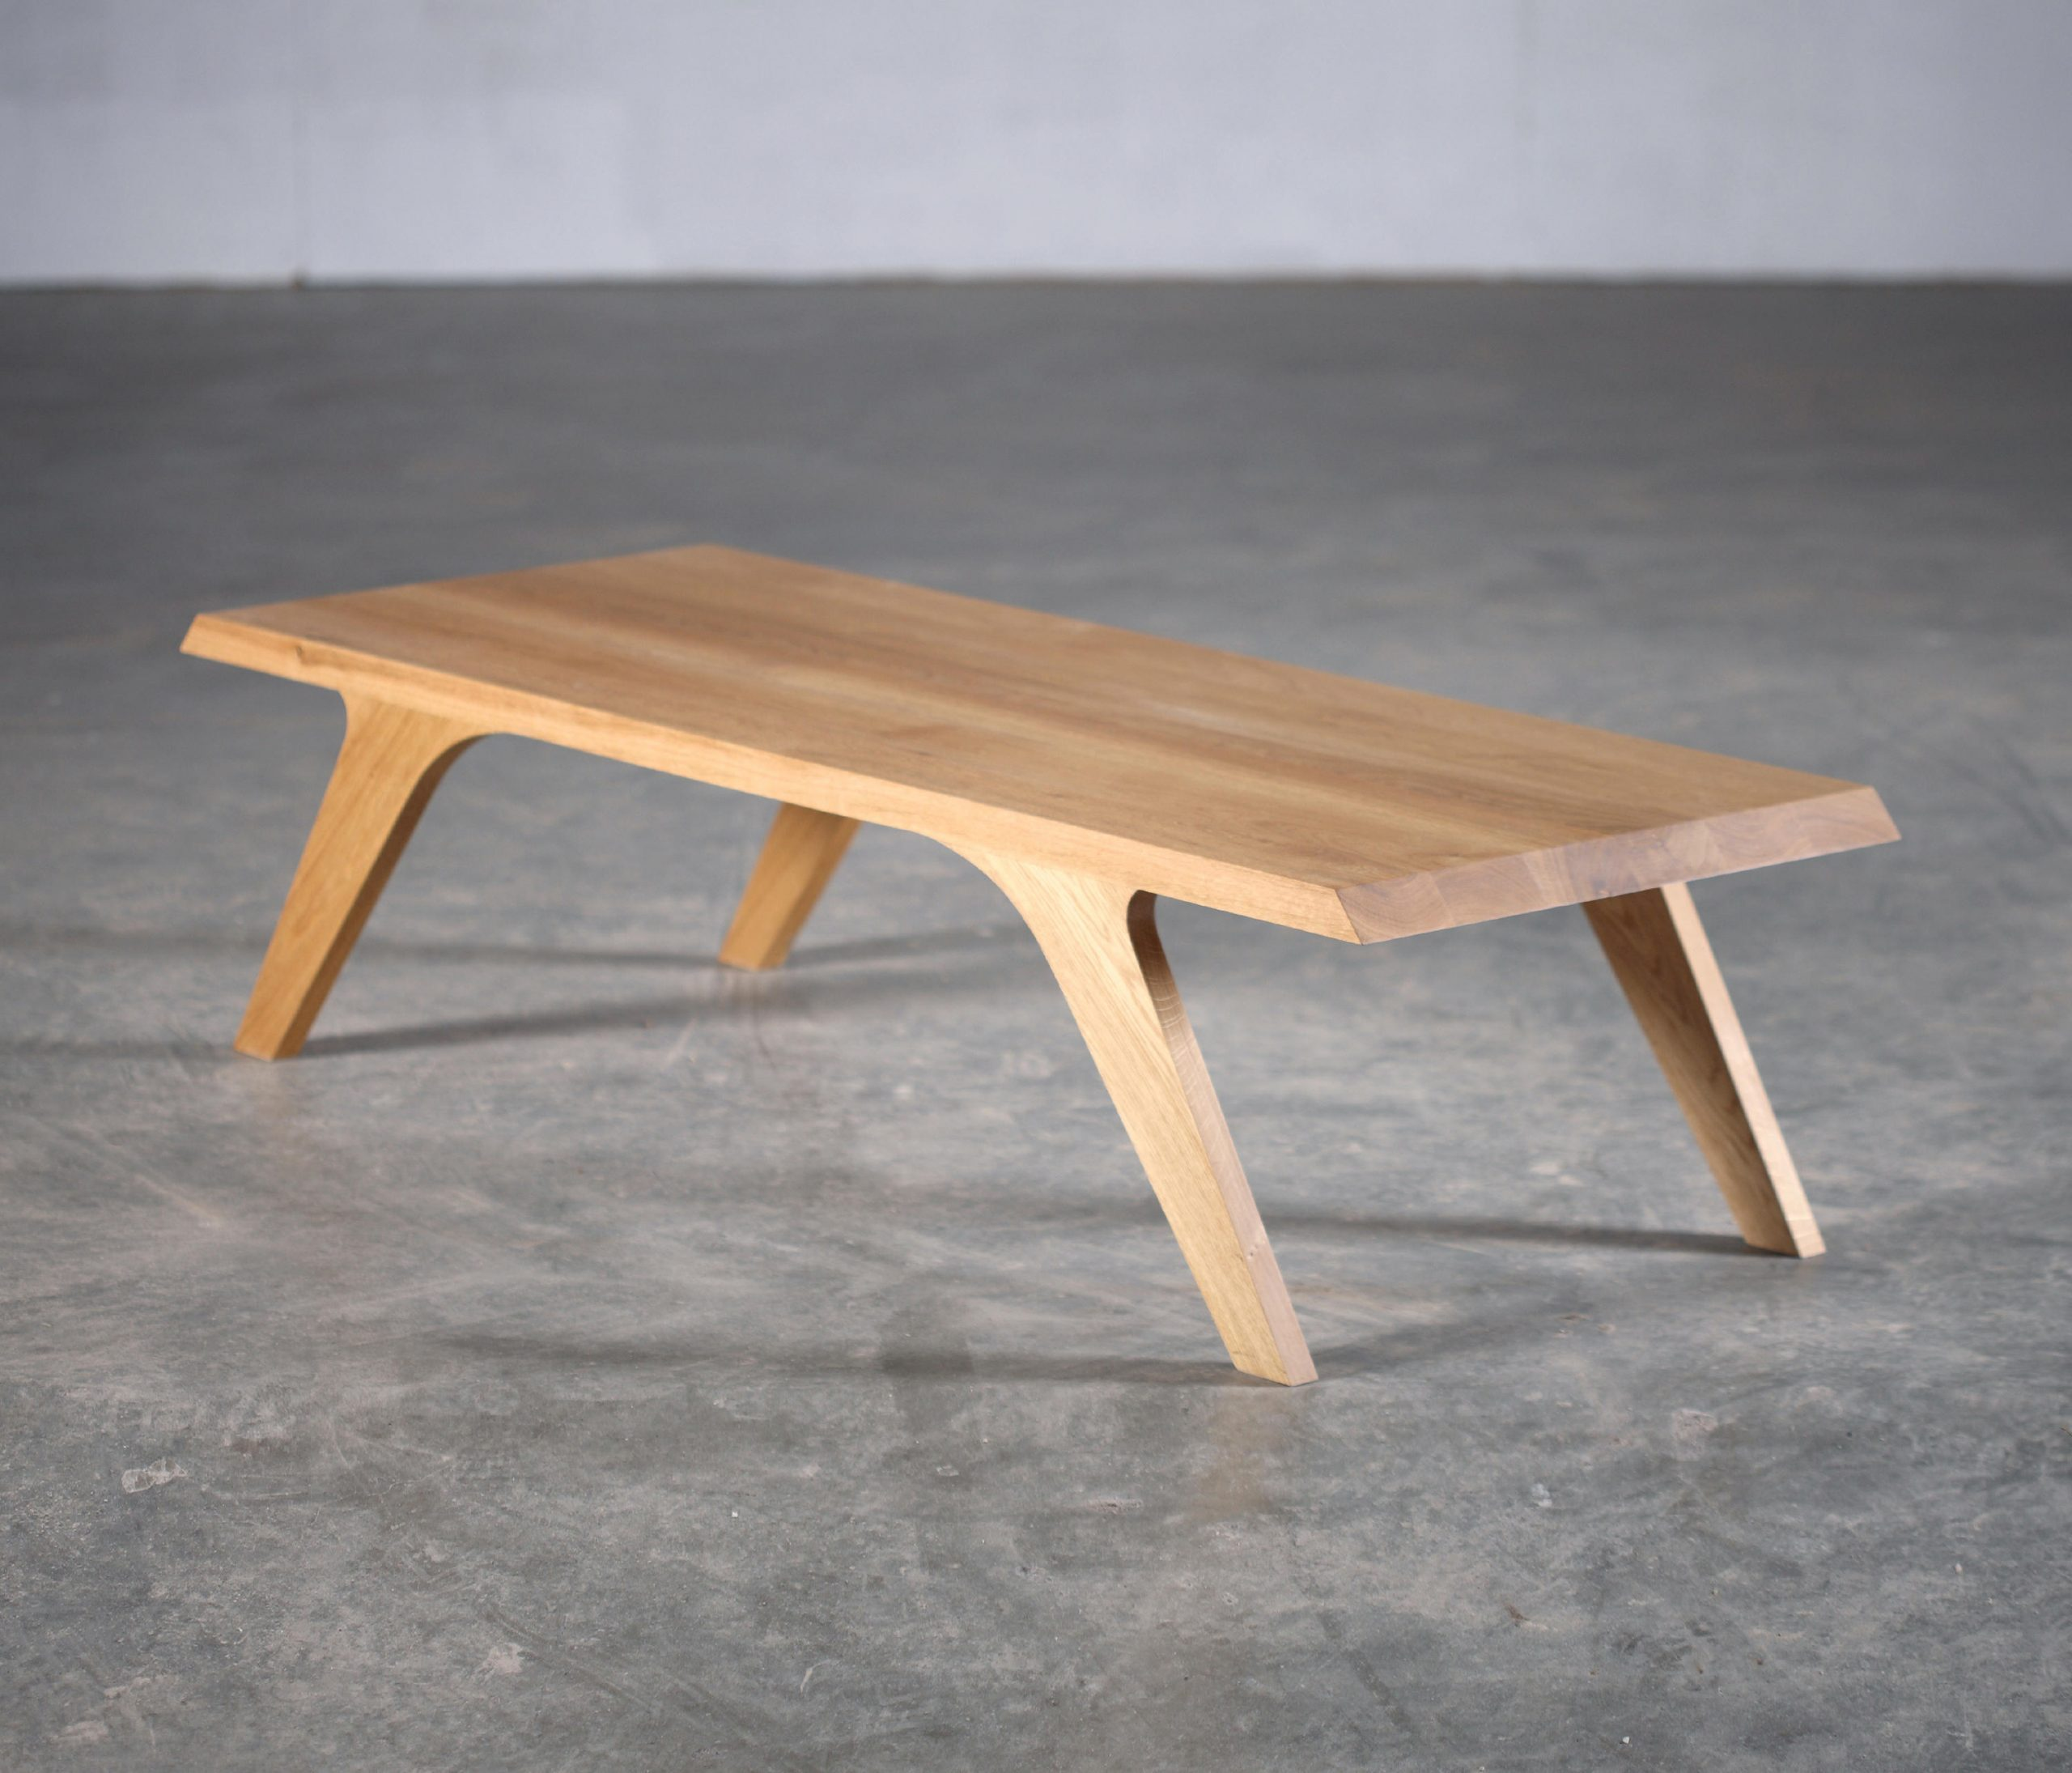 Uno Coffee Table - Tables Basses De Artisan   Architonic encequiconcerne Carrelage Id 76753 Cappucino